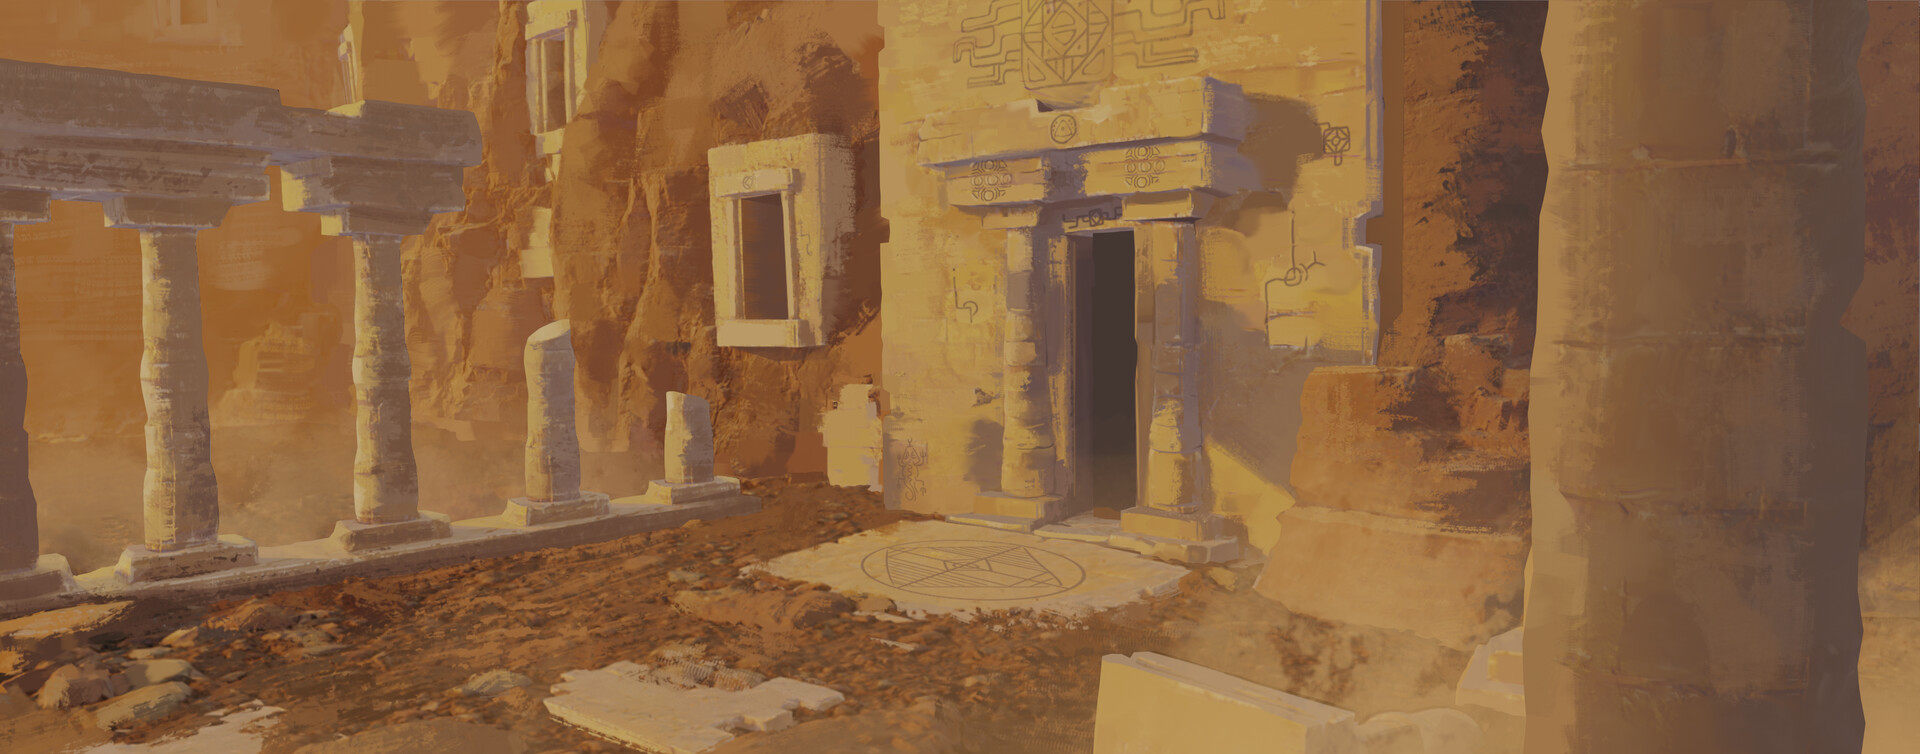 [Image: lewis-monson-dessert-temple.jpg?1622696340]